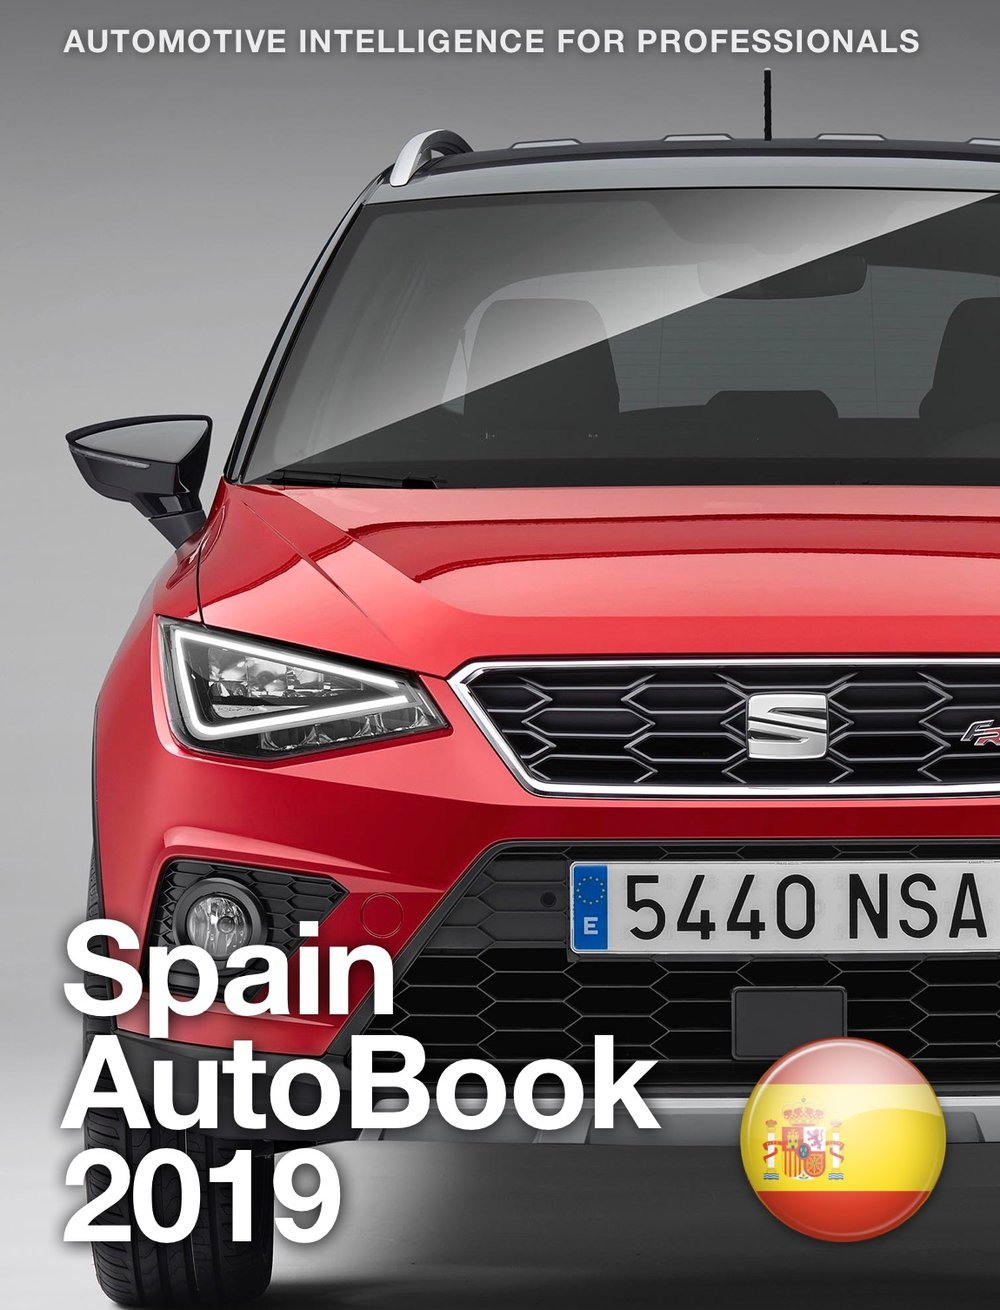 Spain AutoBook 2018 1025x1339.jpg